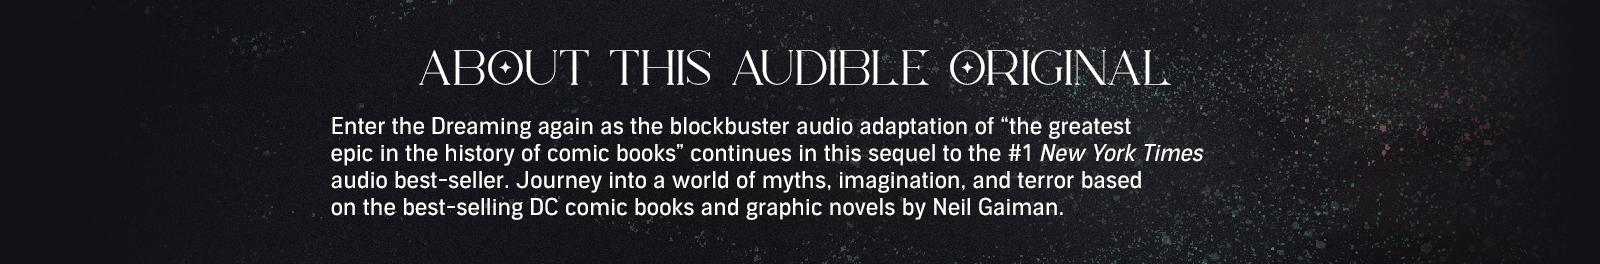 An Audible Original series by Neil Gaimain